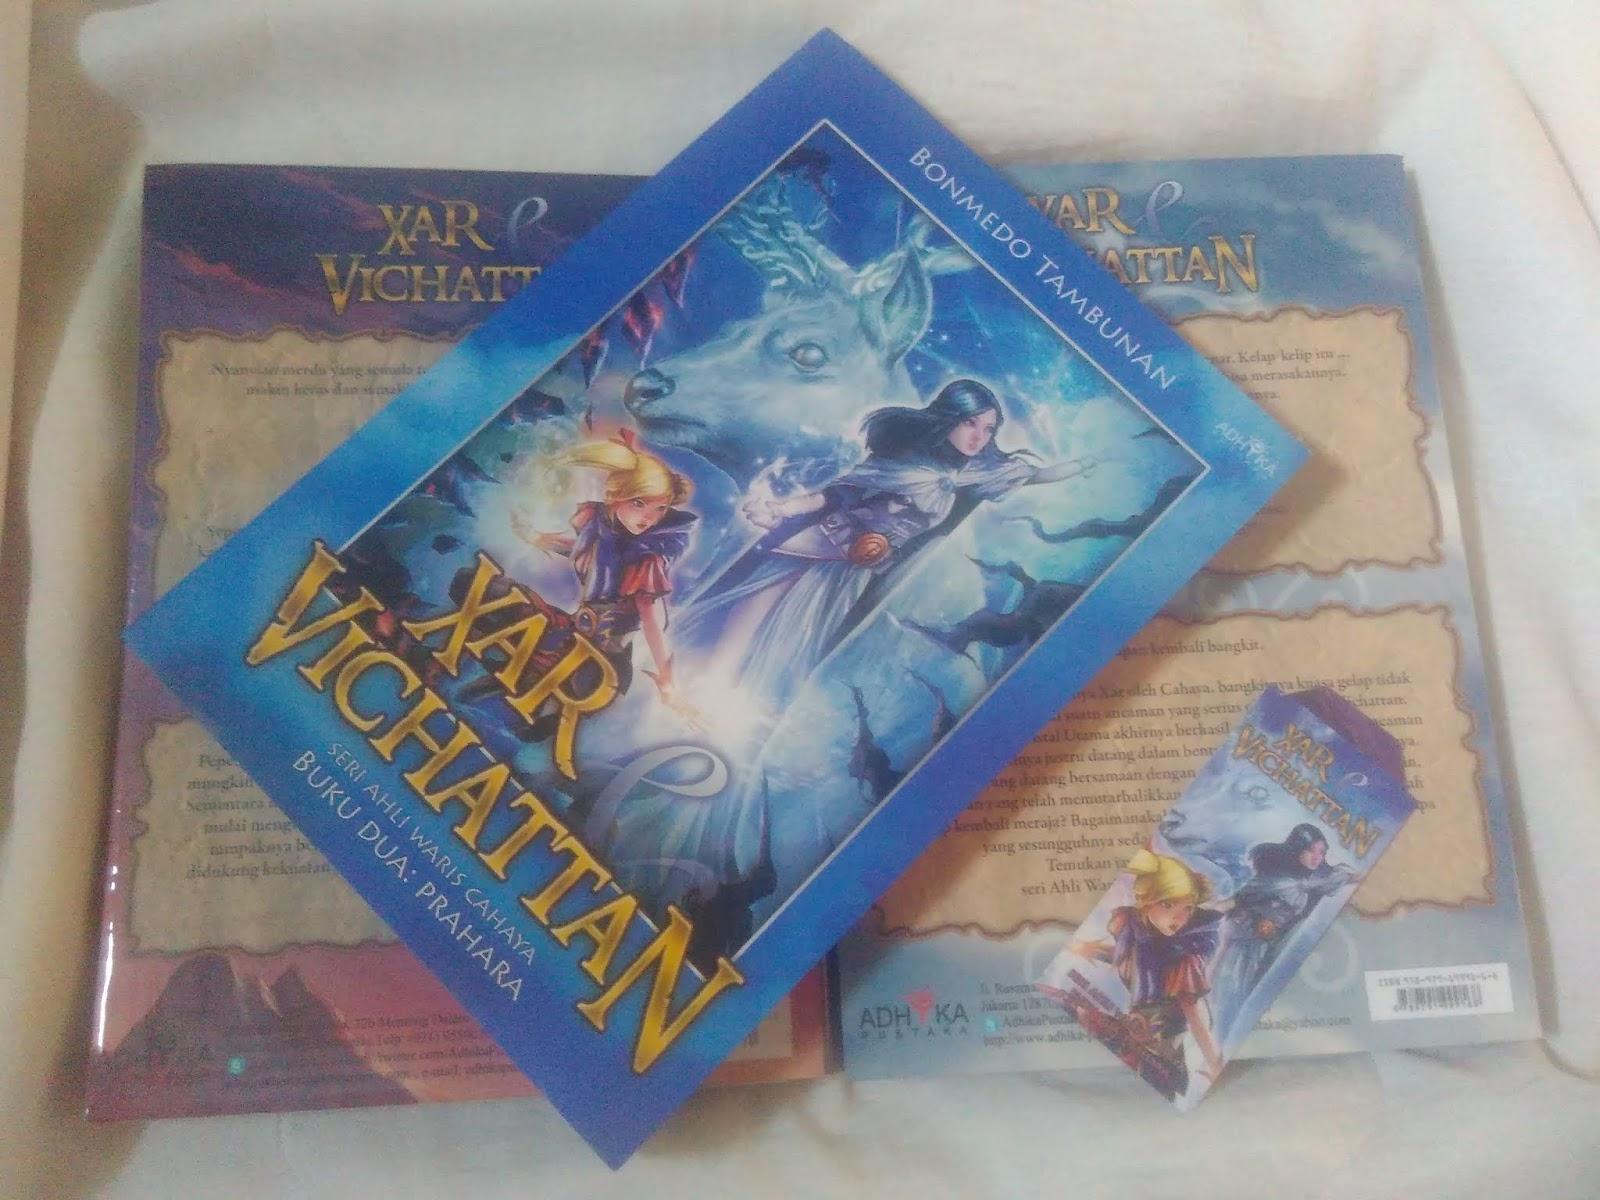 Review Buku Xar & Vichattan: Prahara by Bonmedo Tambunan